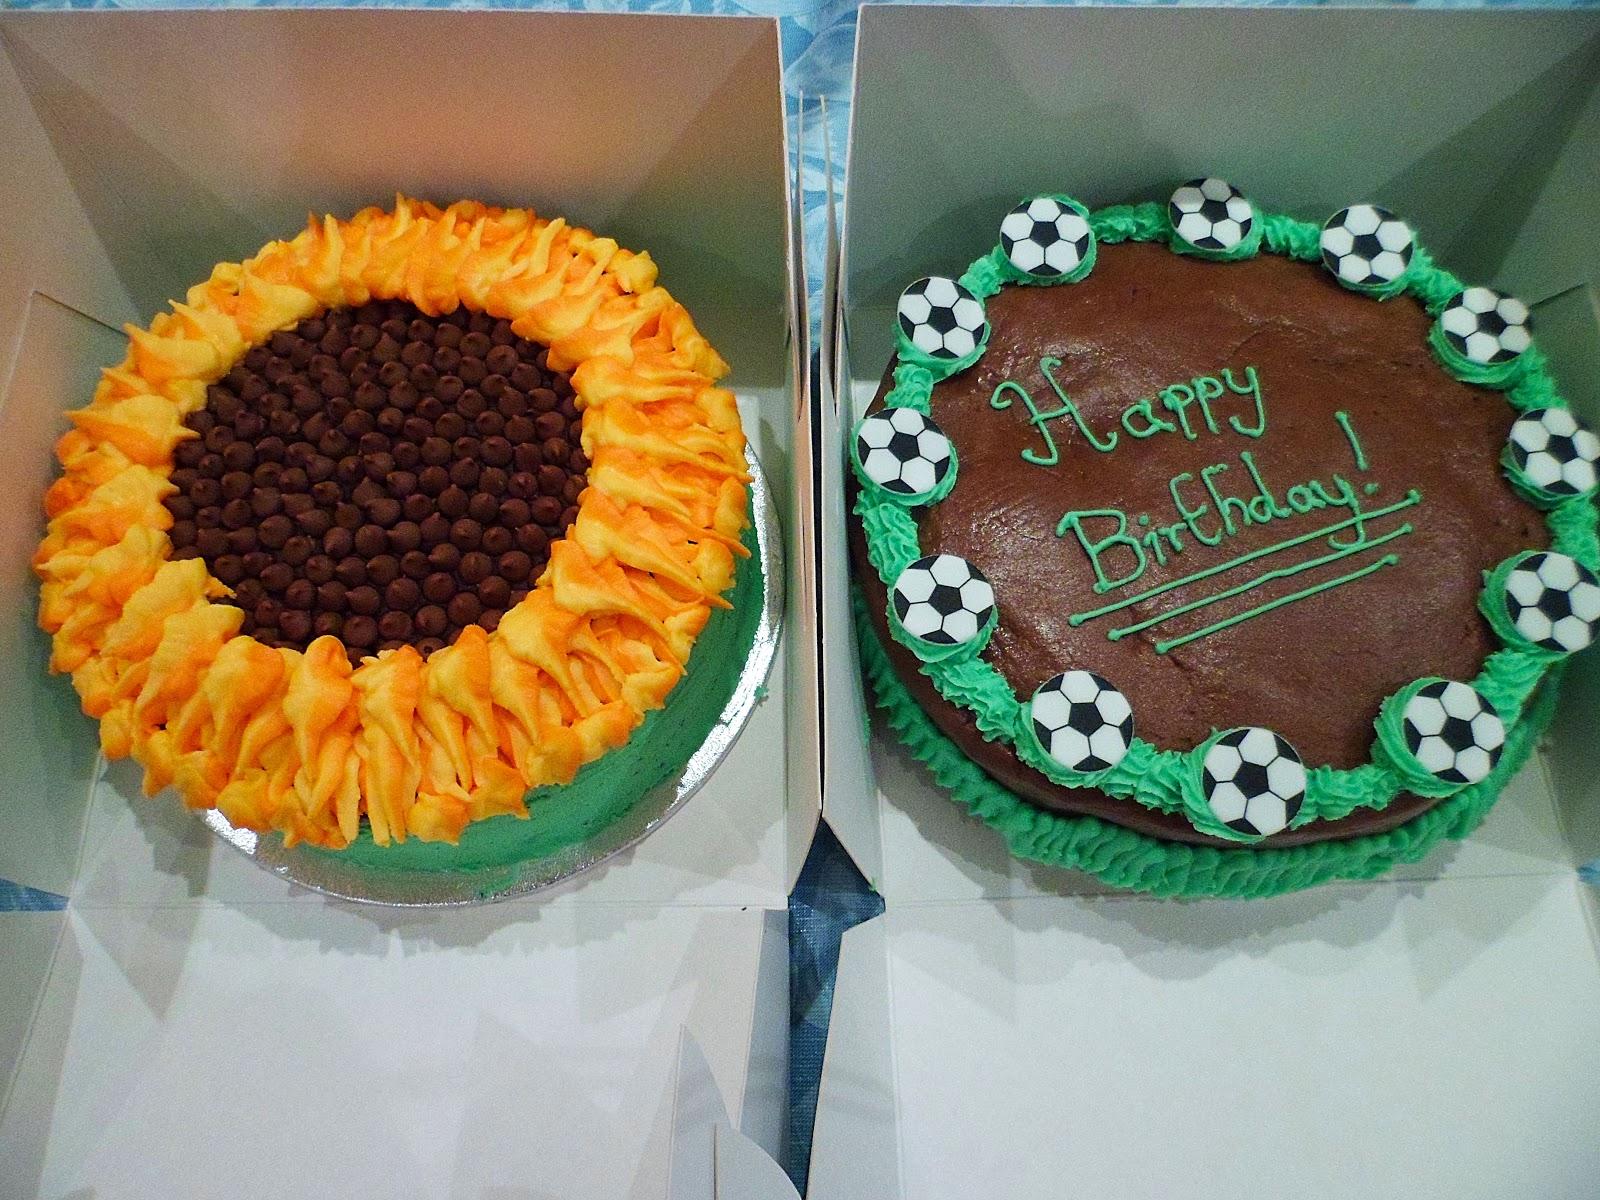 Dove Farm Gluten Free Chocolate Cake